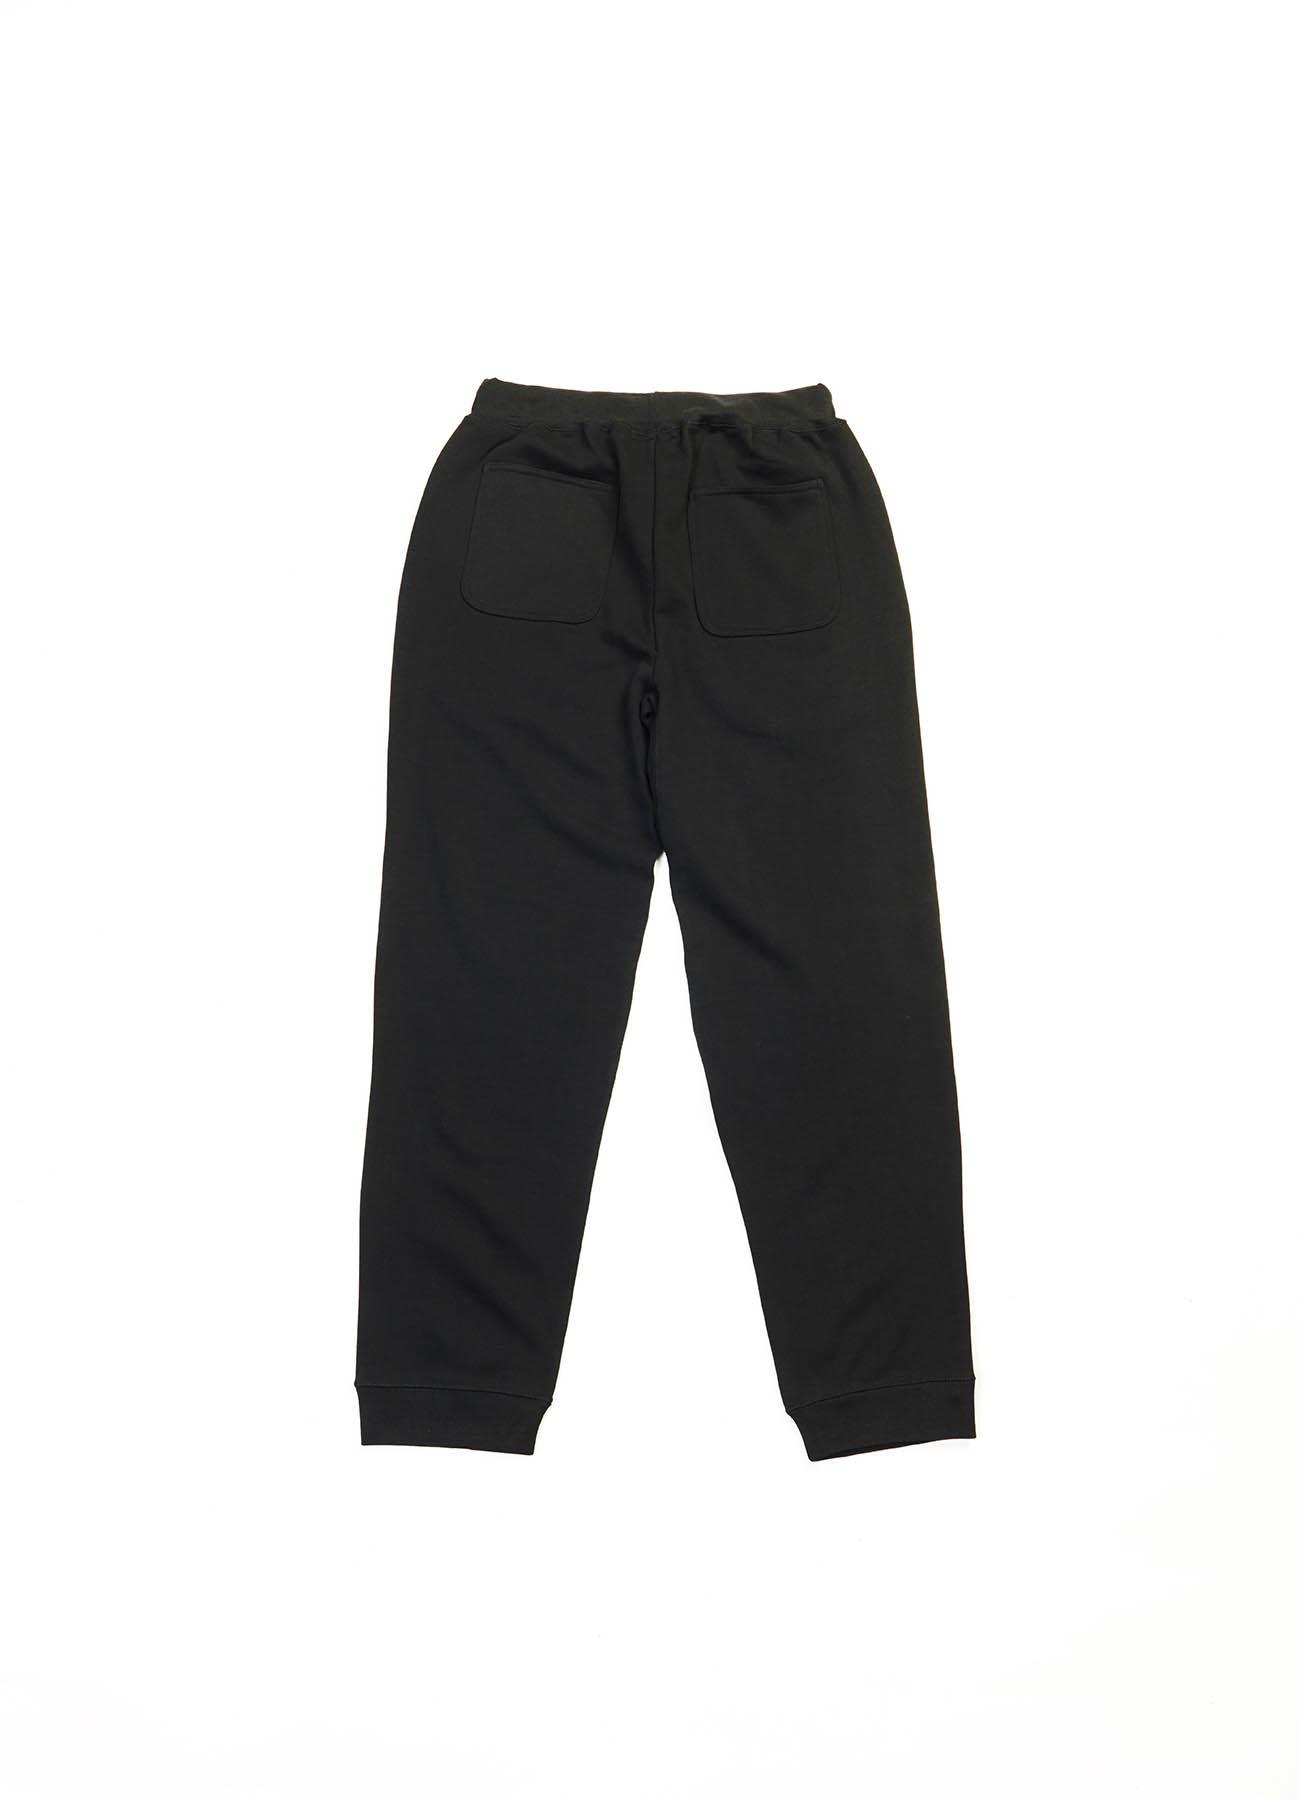 -Online EXCLUSIVE- Y's logo Track pants